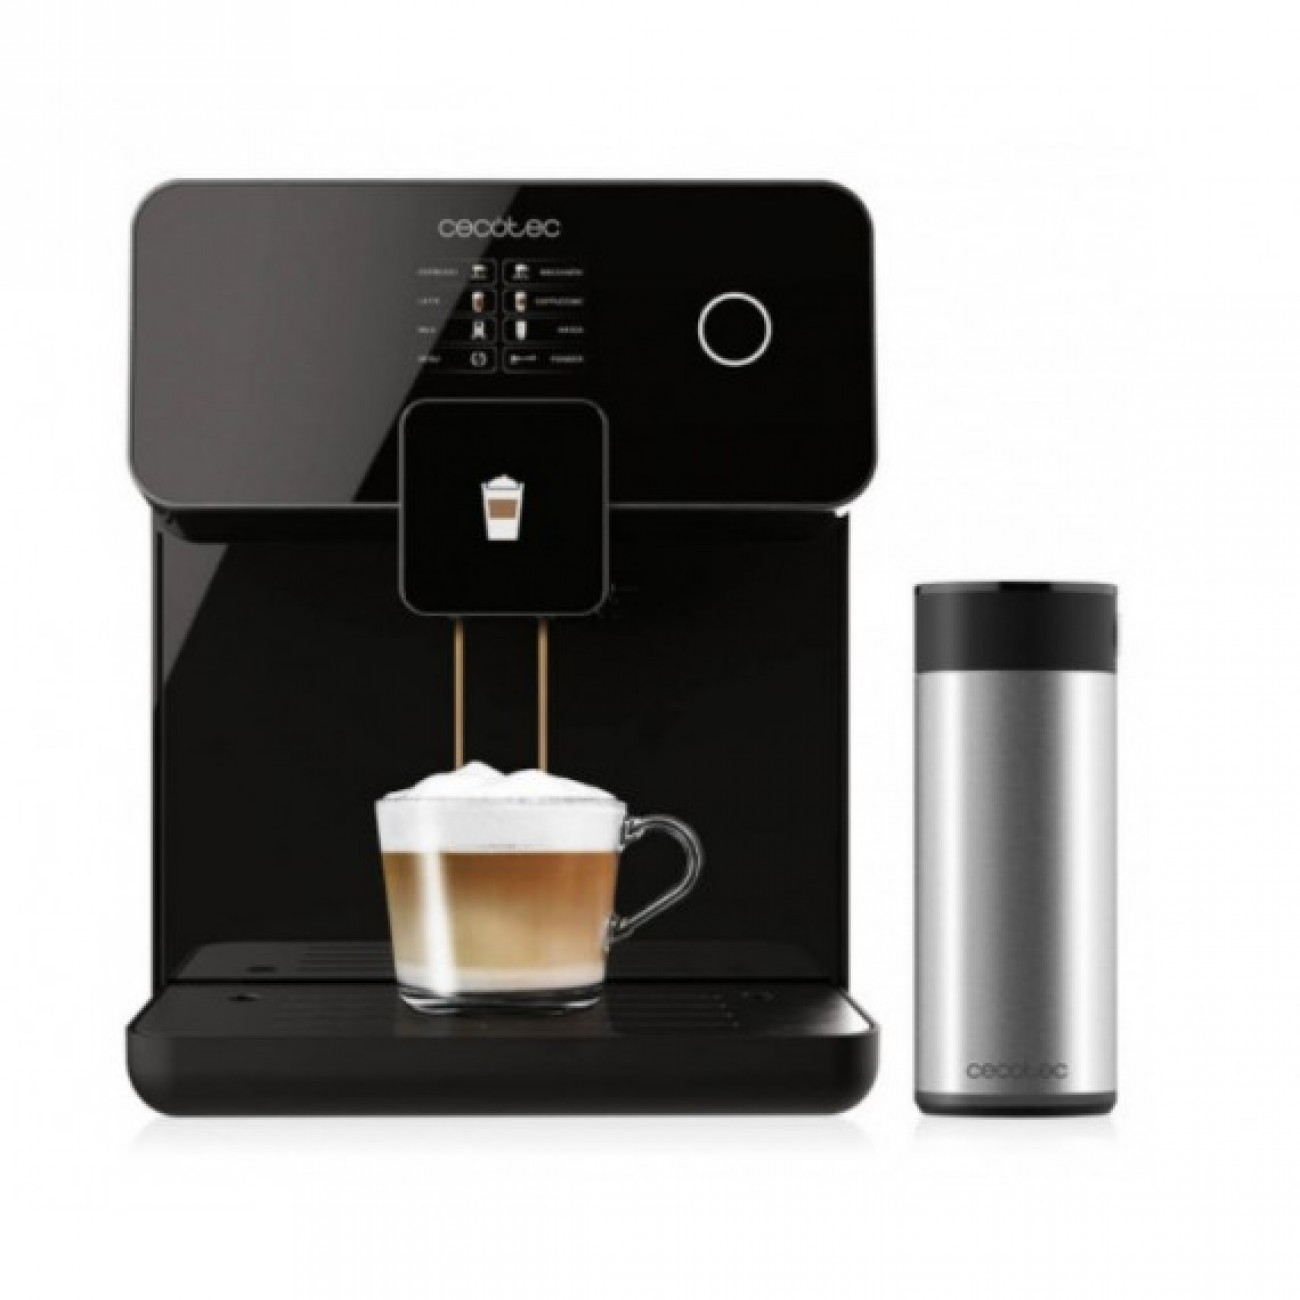 Кафеавтомат Cecotec Power Matic-ccino 8000 Touch Serie Nera в Кафемашини -  | Alleop